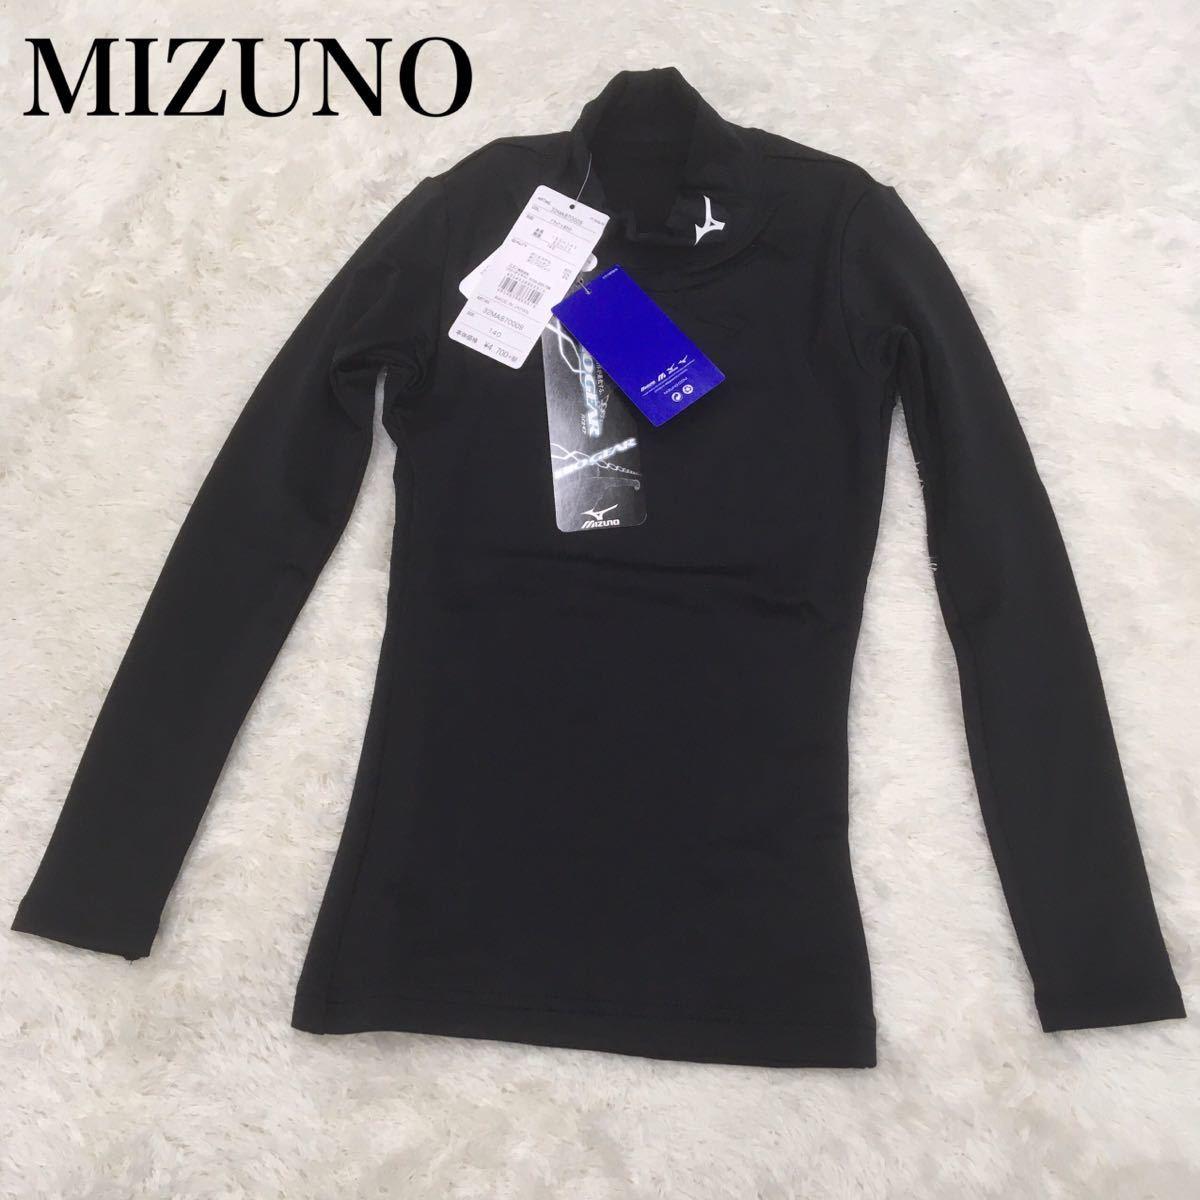 MIZUNO ミズノ BIO GERE バイオギア スポーツウェア インナー 長袖ハイネック ストレッチ 子供用 サイズ140 黒